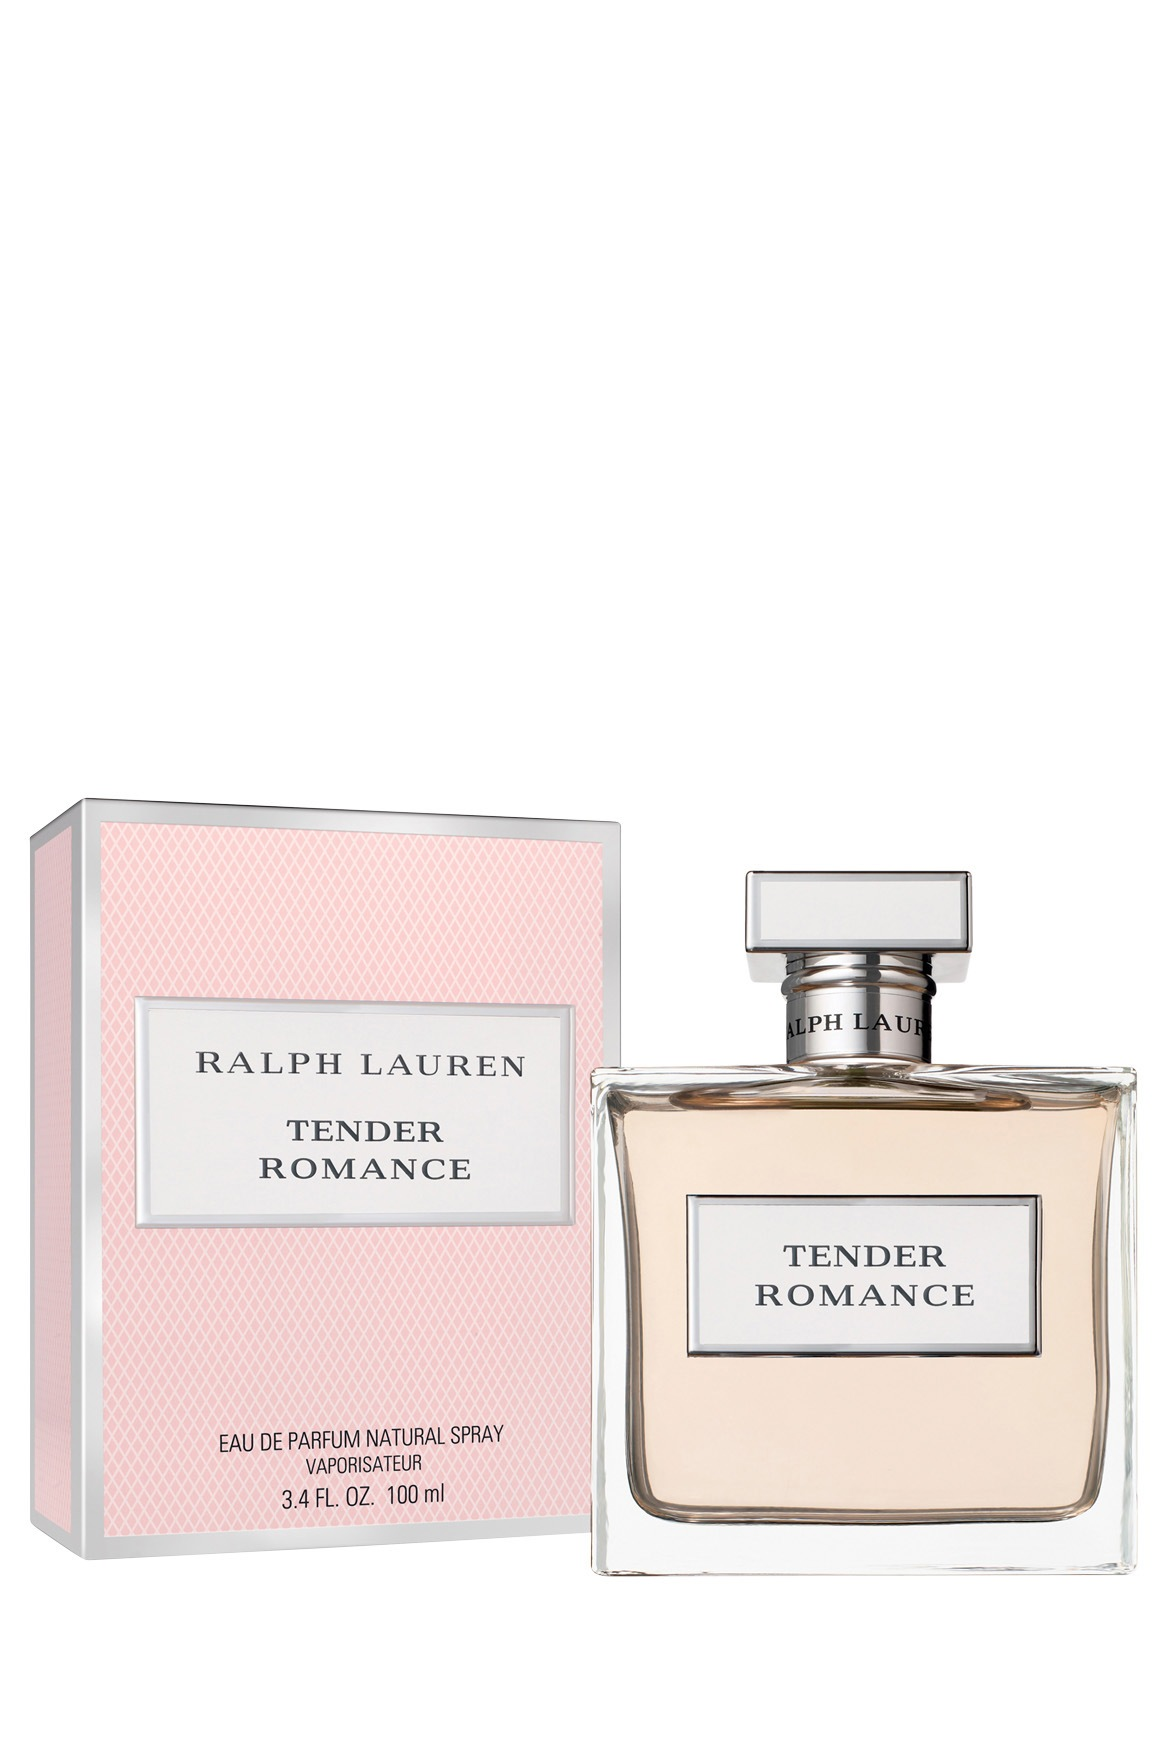 romance perfume mens black ralph lauren trainers